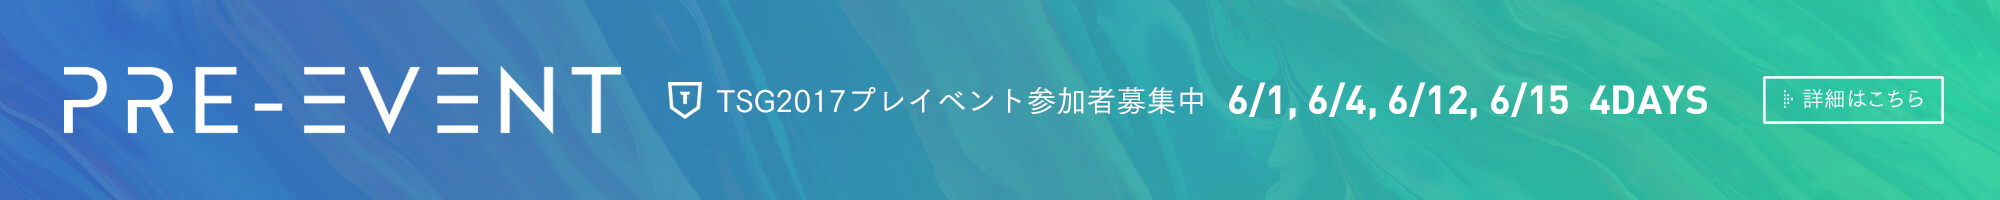 PRE-EVENT TSG2017プレイベント 第一弾4連続イベント・参加者募集中